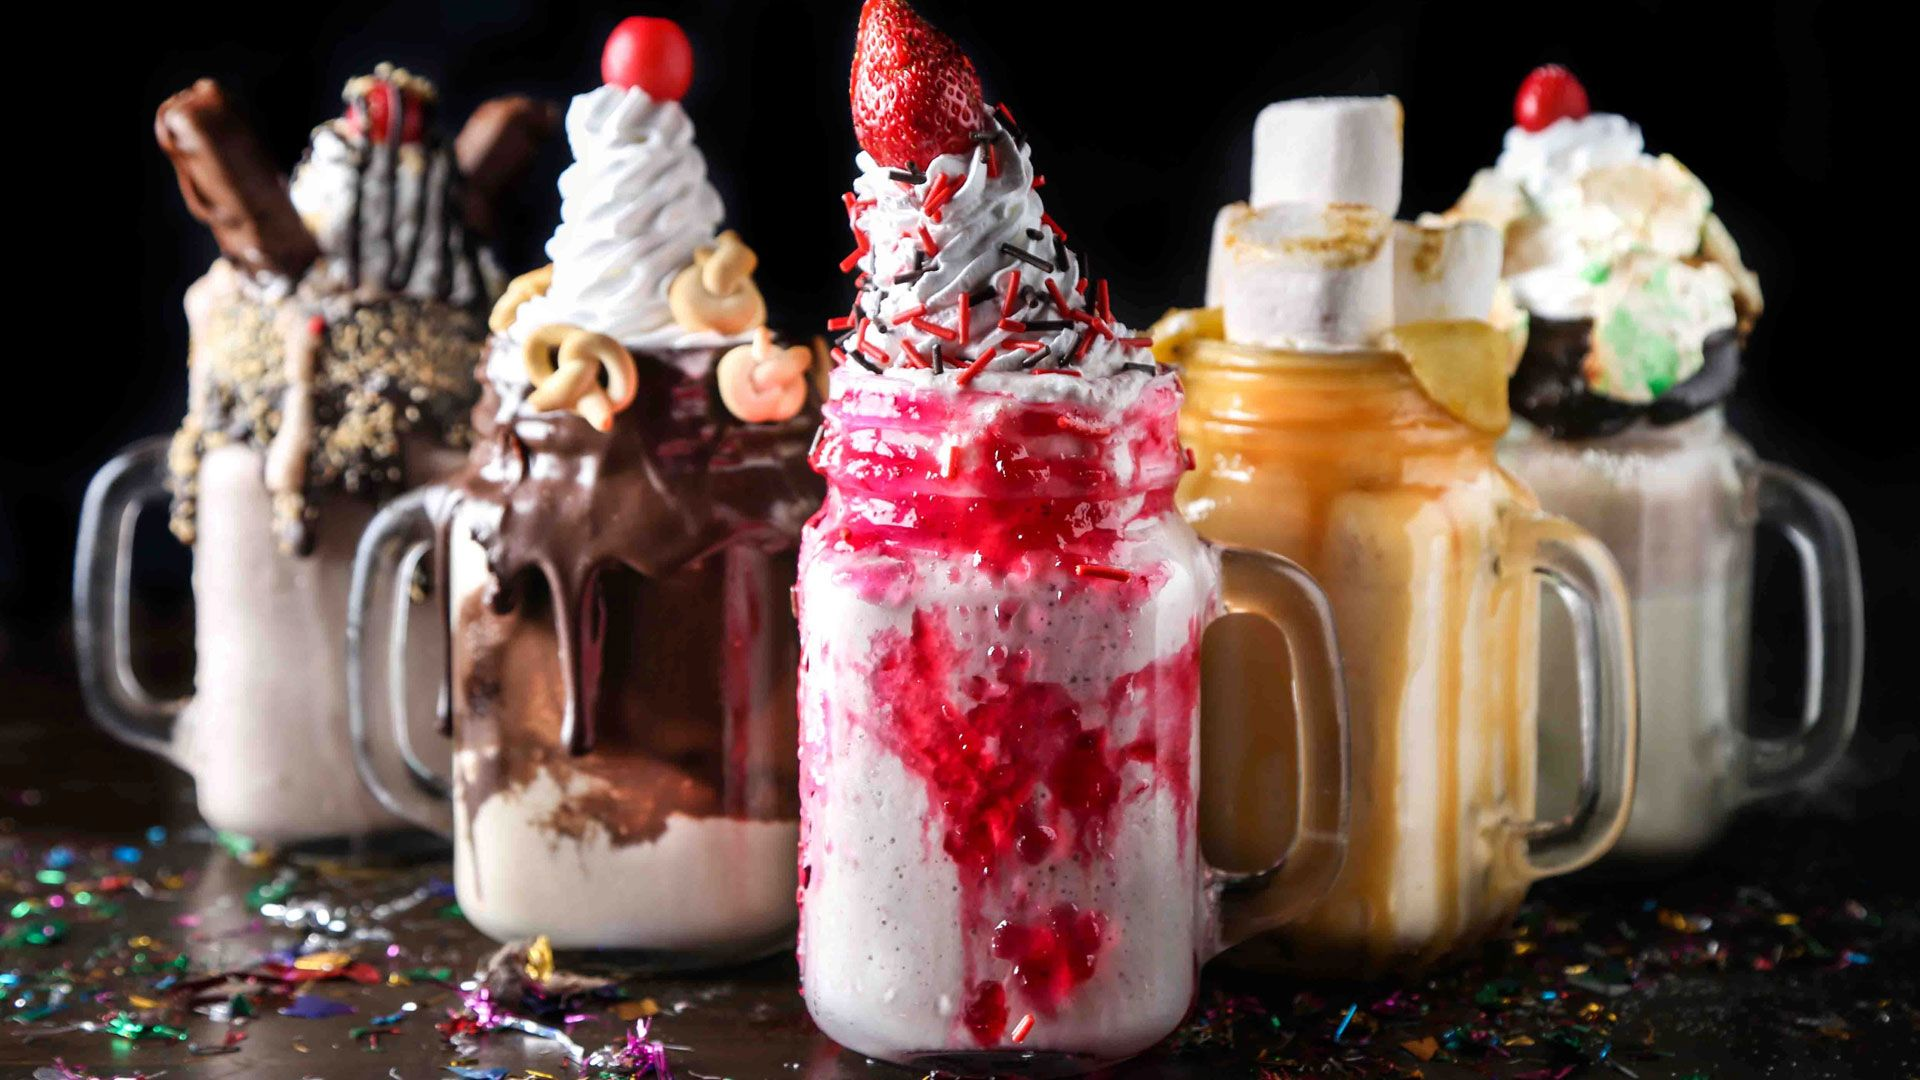 Where To Find The Best Milkshakes To Cool Off With In Your City Freakshakes Recipe Freak Shakes Best Milkshakes